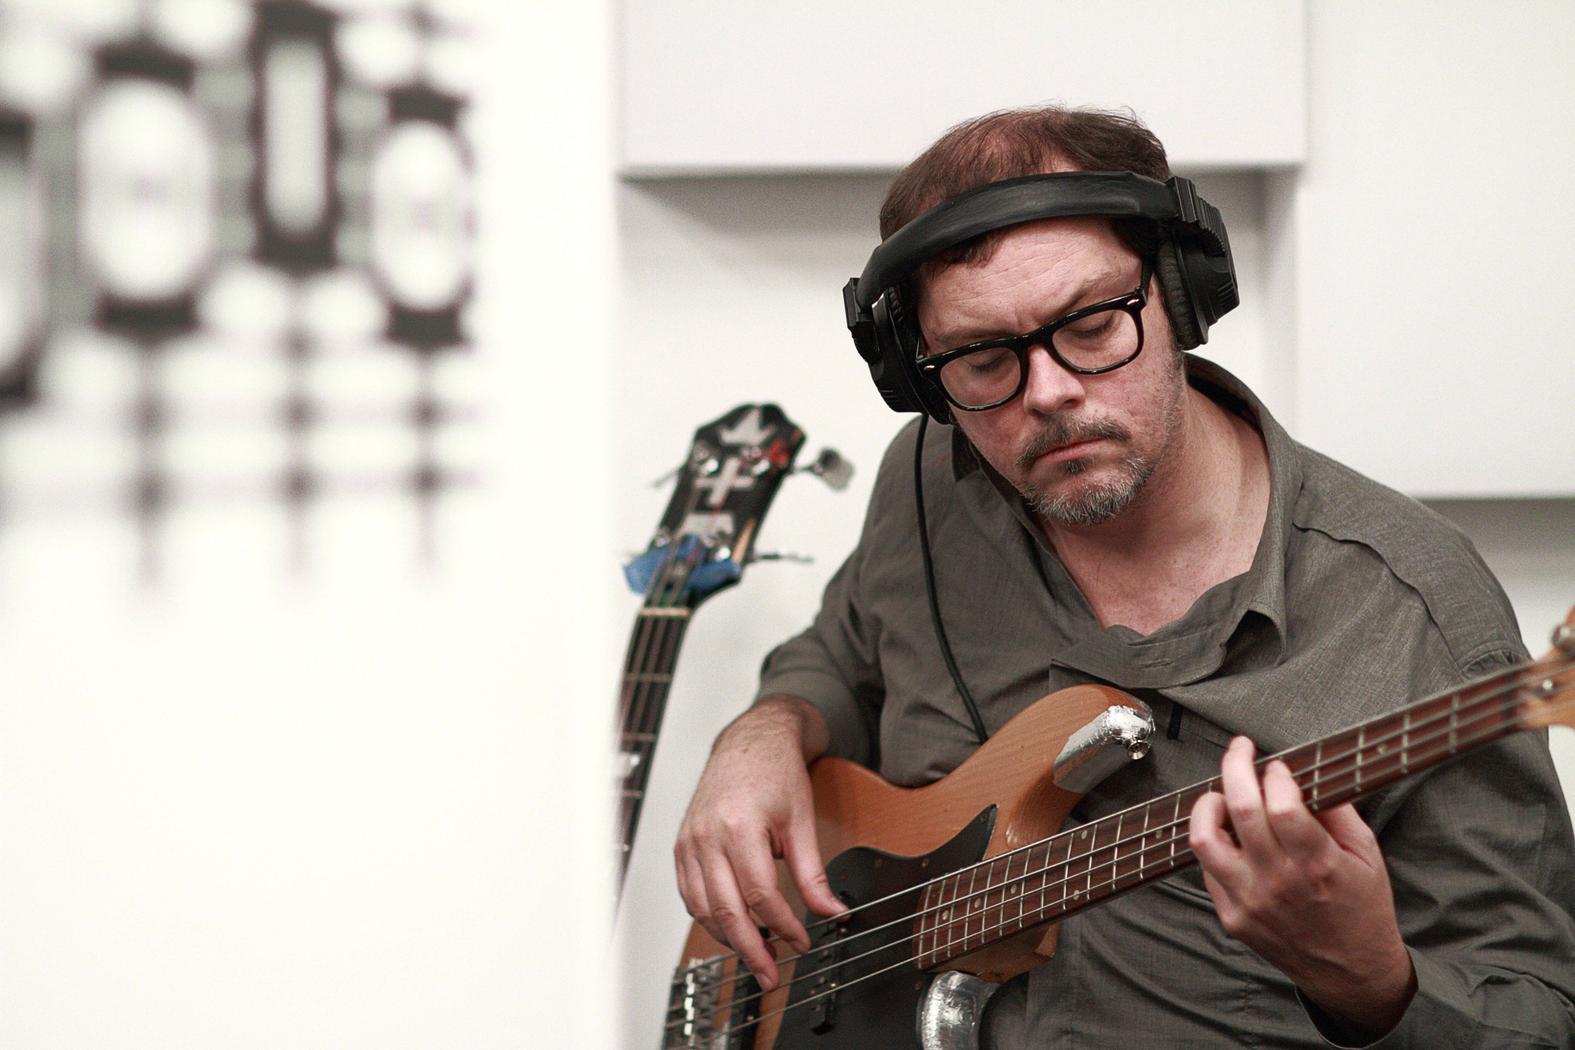 I Link 2 Music Appoints 'Bassy' Bob Brockmann to Advisory Board